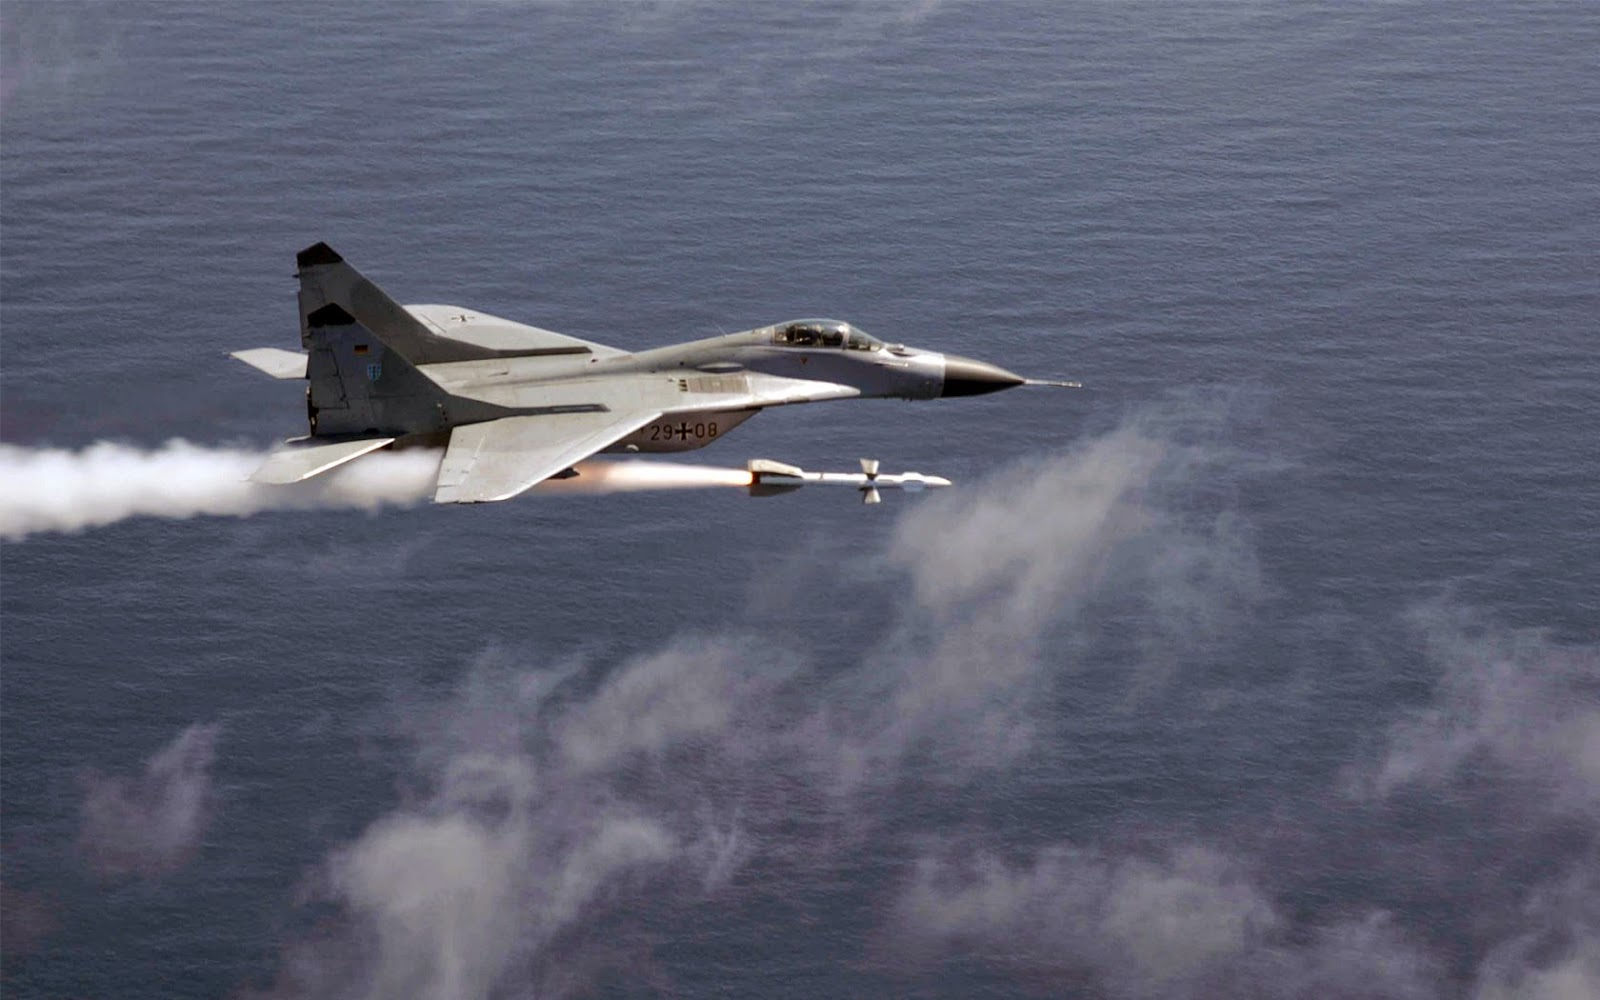 Best Wallpaper: India Air Force Wallpaper Hd Free Download